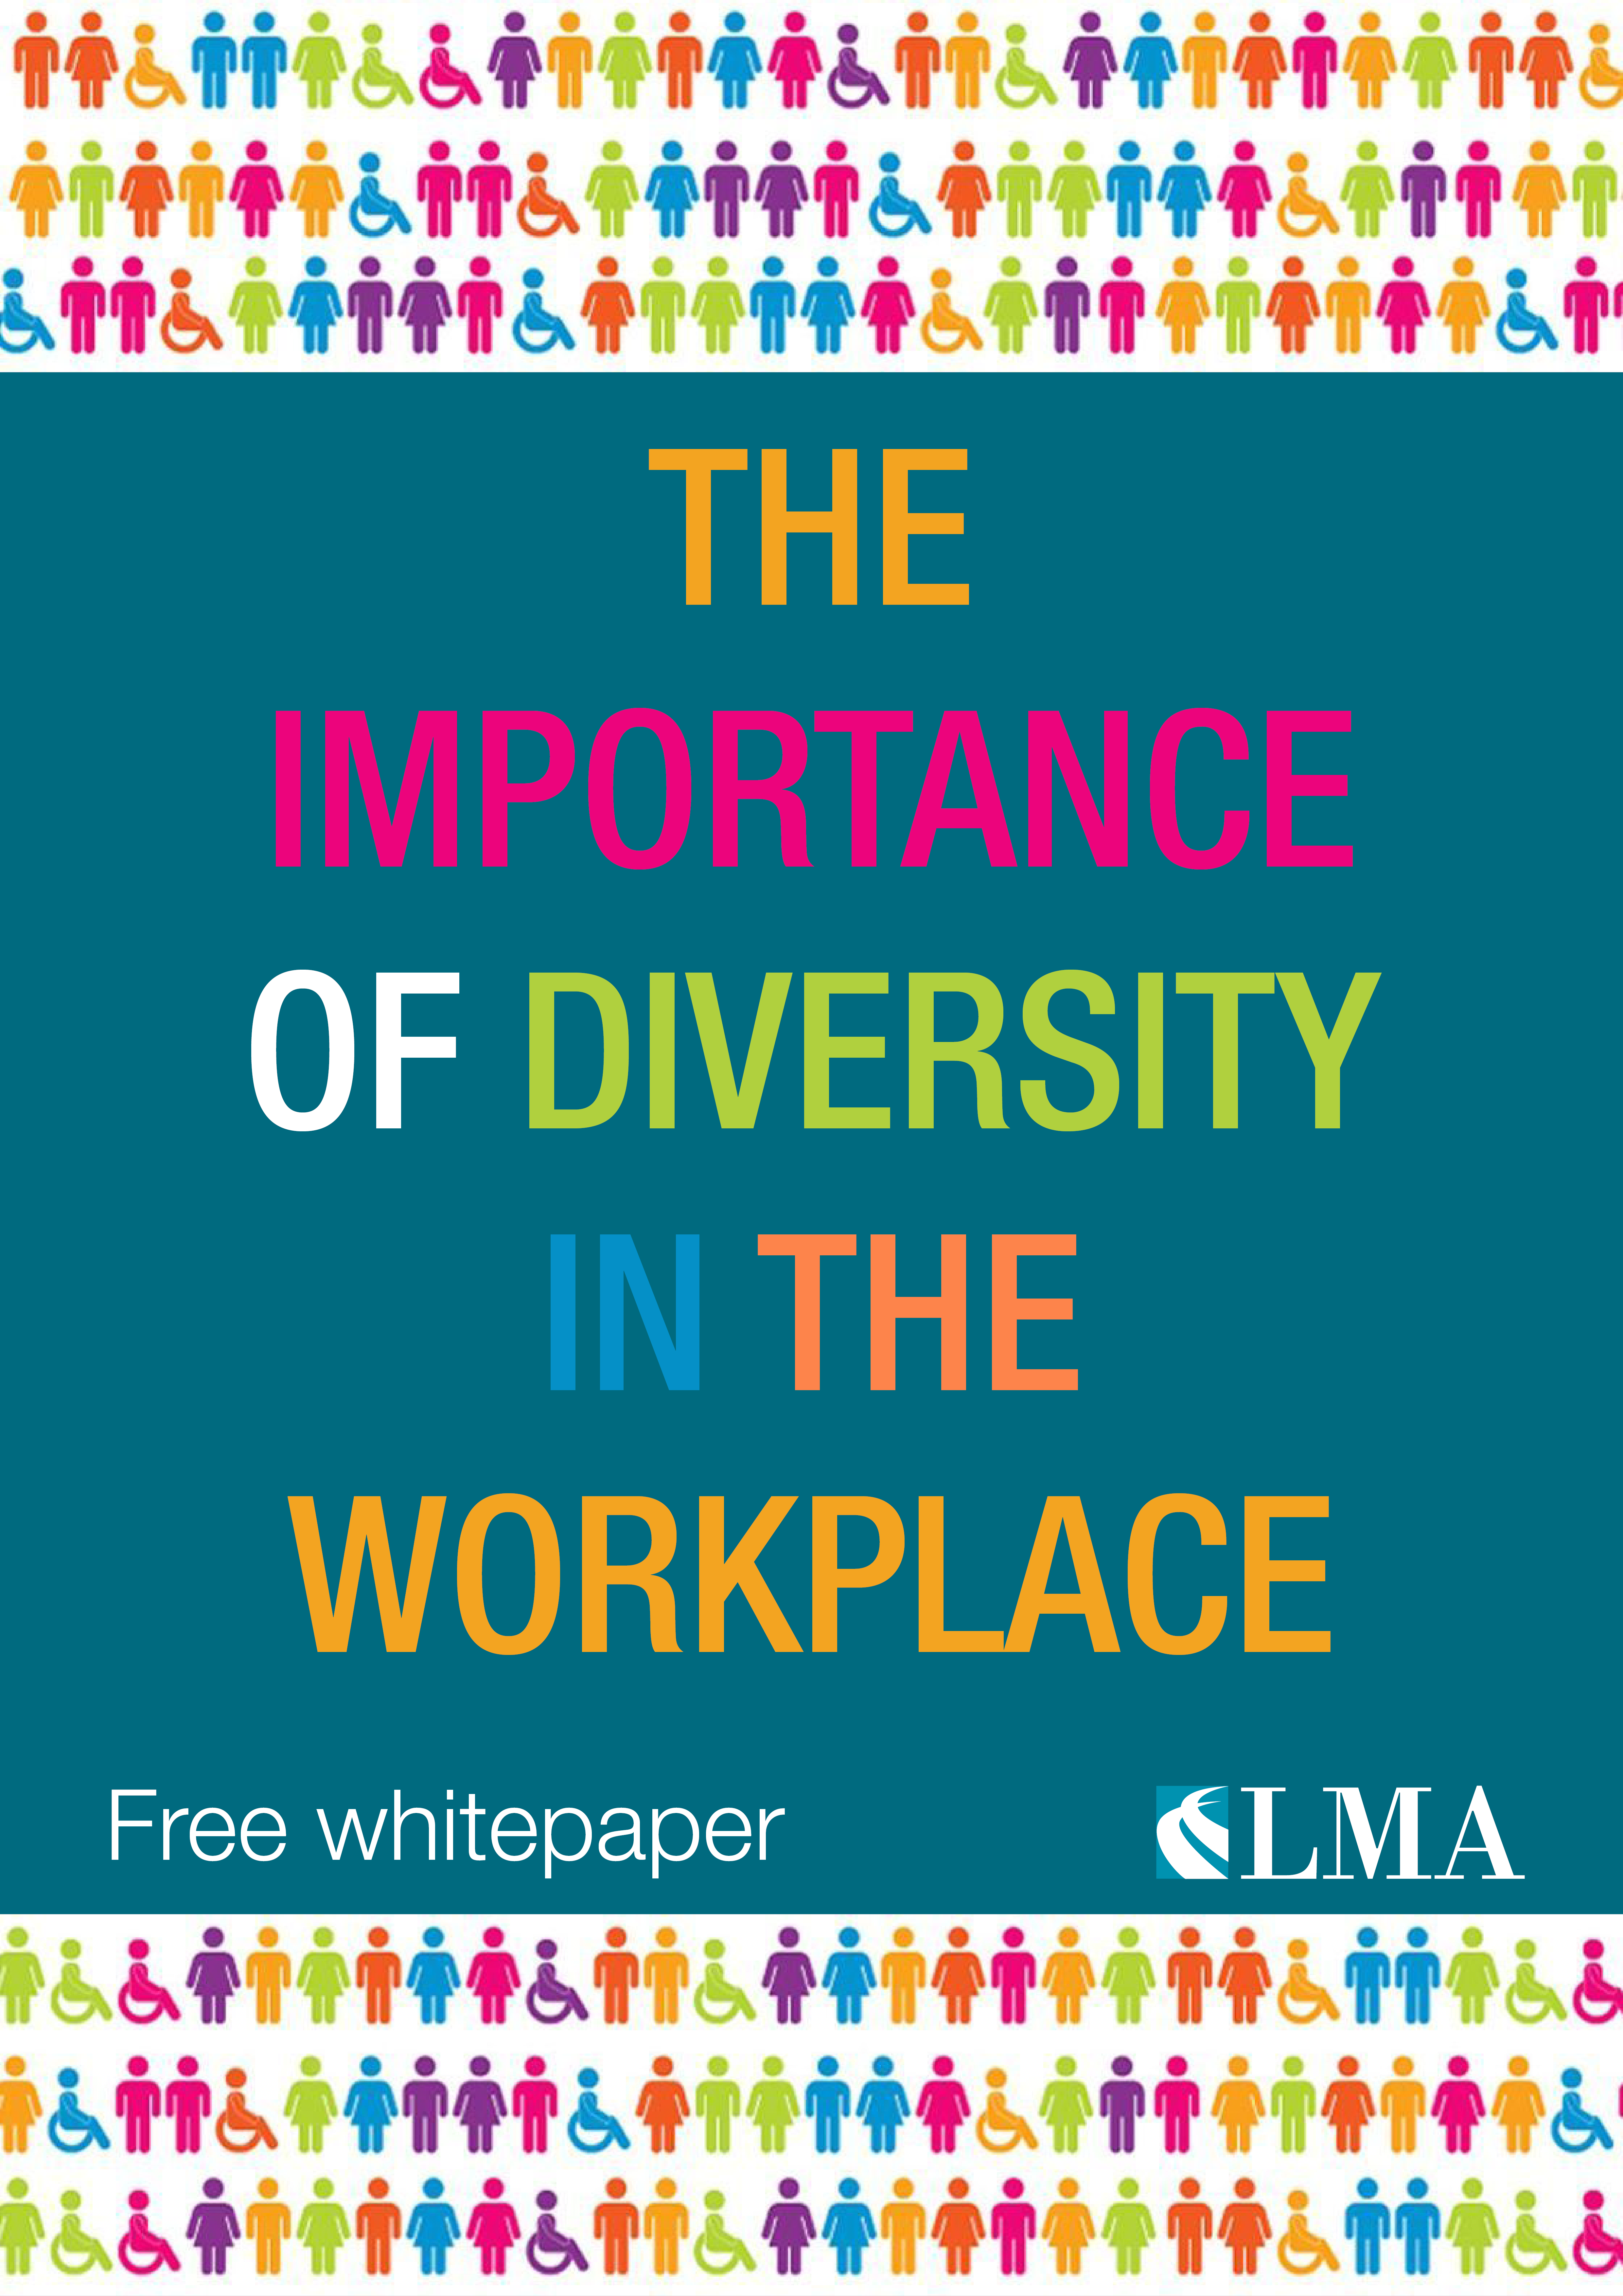 Gender diversity in the workplace essays on friendship